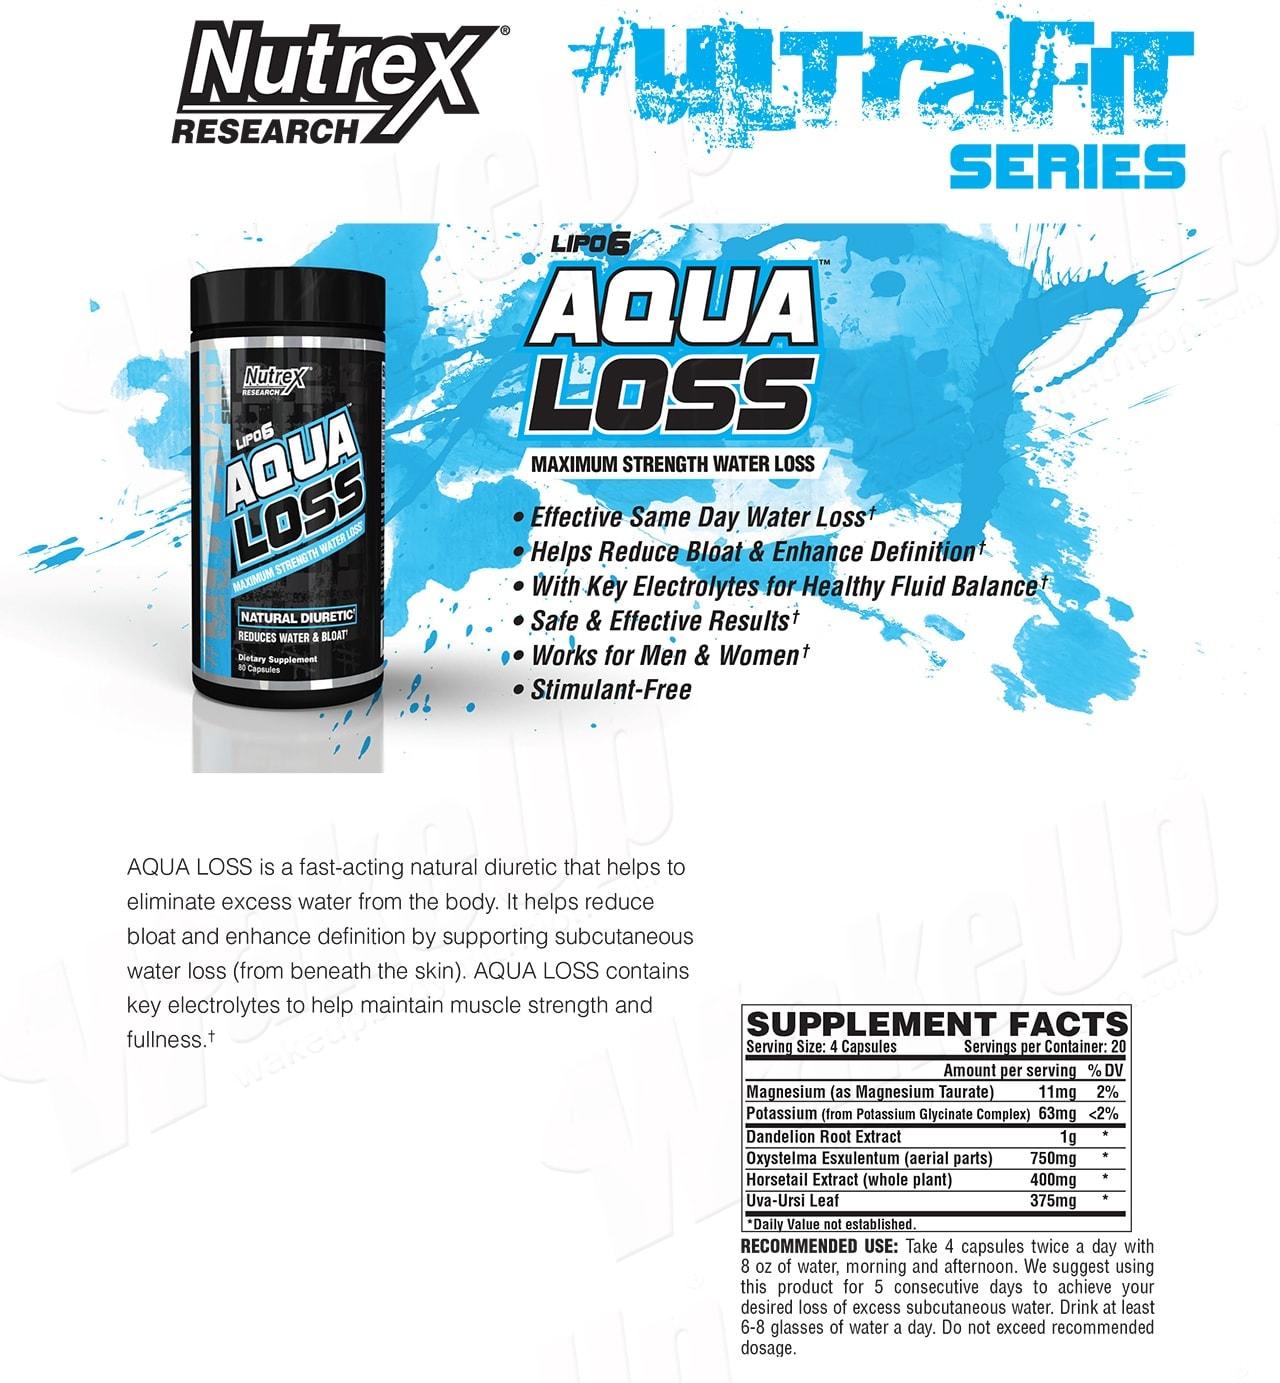 Nutrex - Aqua Loss (80 viên) - 1dis aqualoss